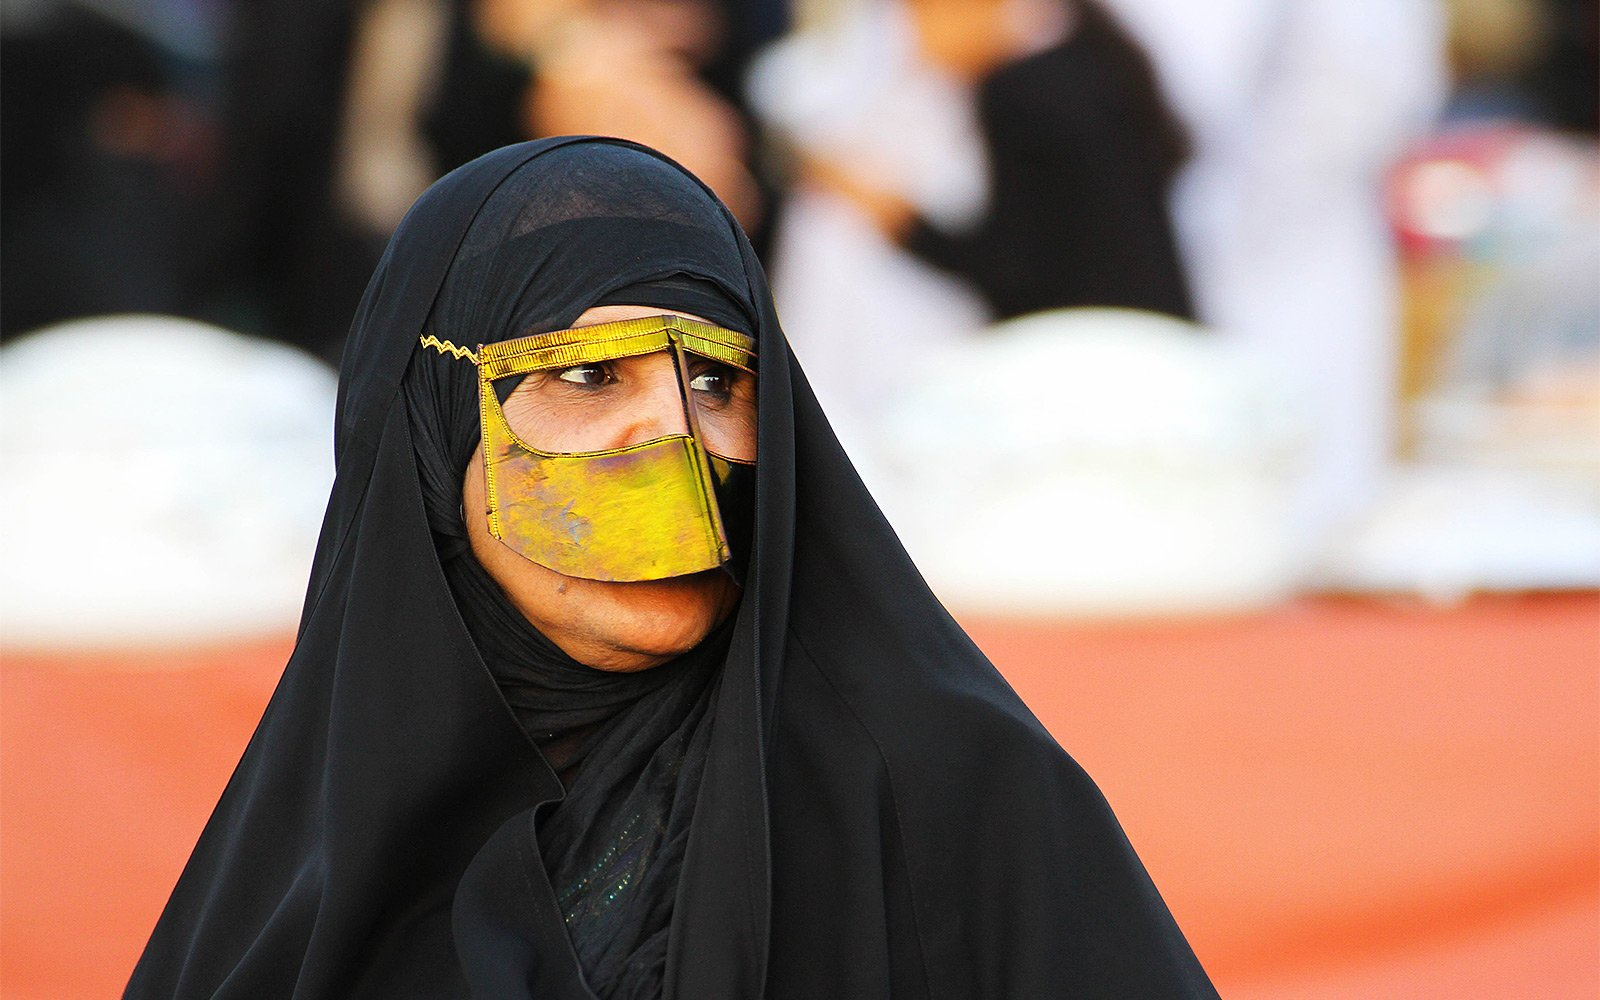 Buy burqain Dubai, United Arab Emirates